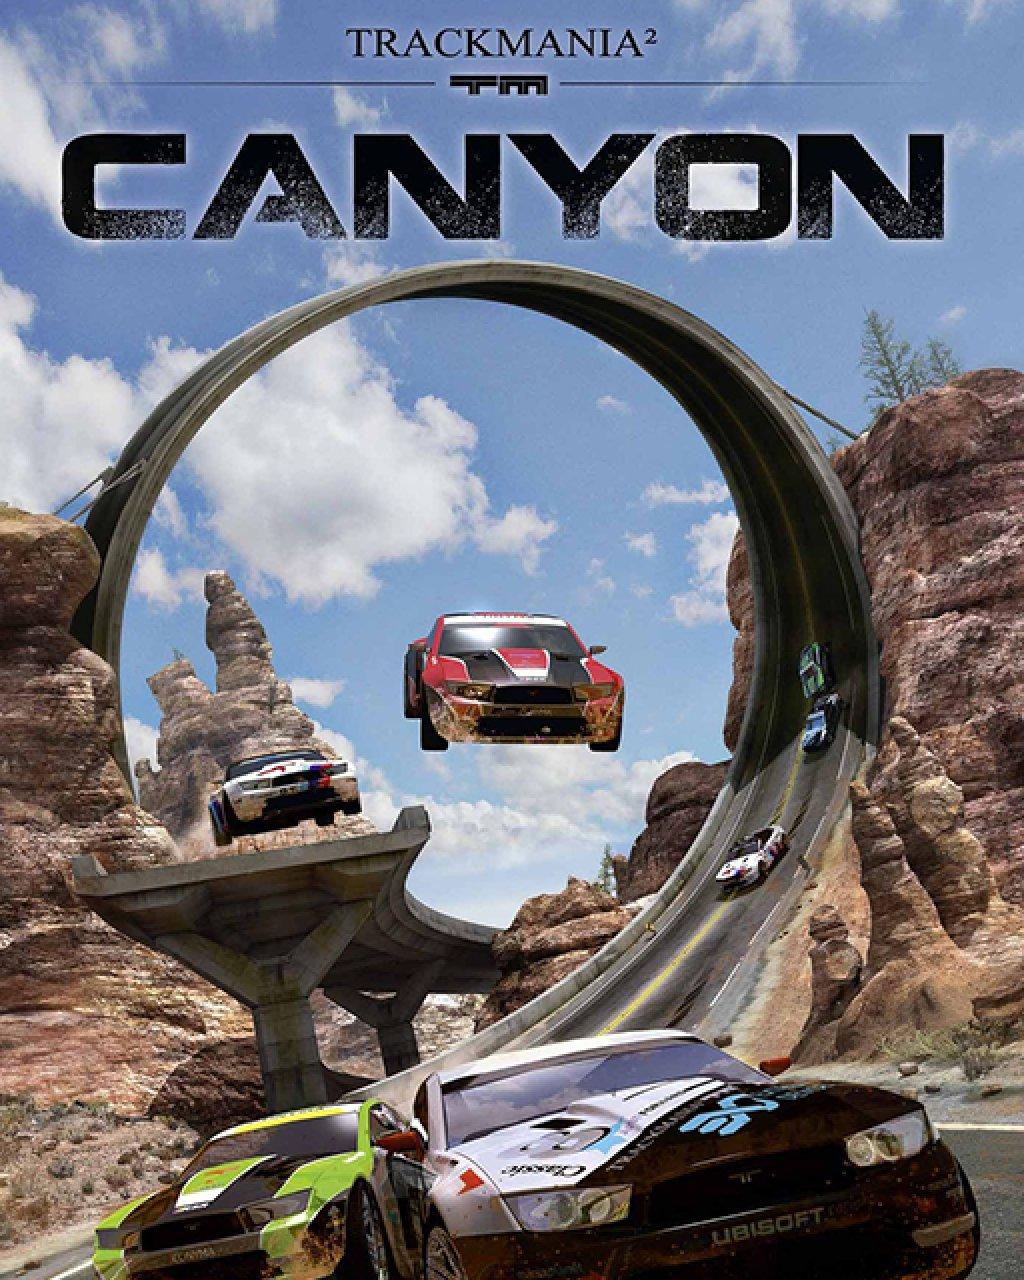 TrackMania 2 Canyon krabice